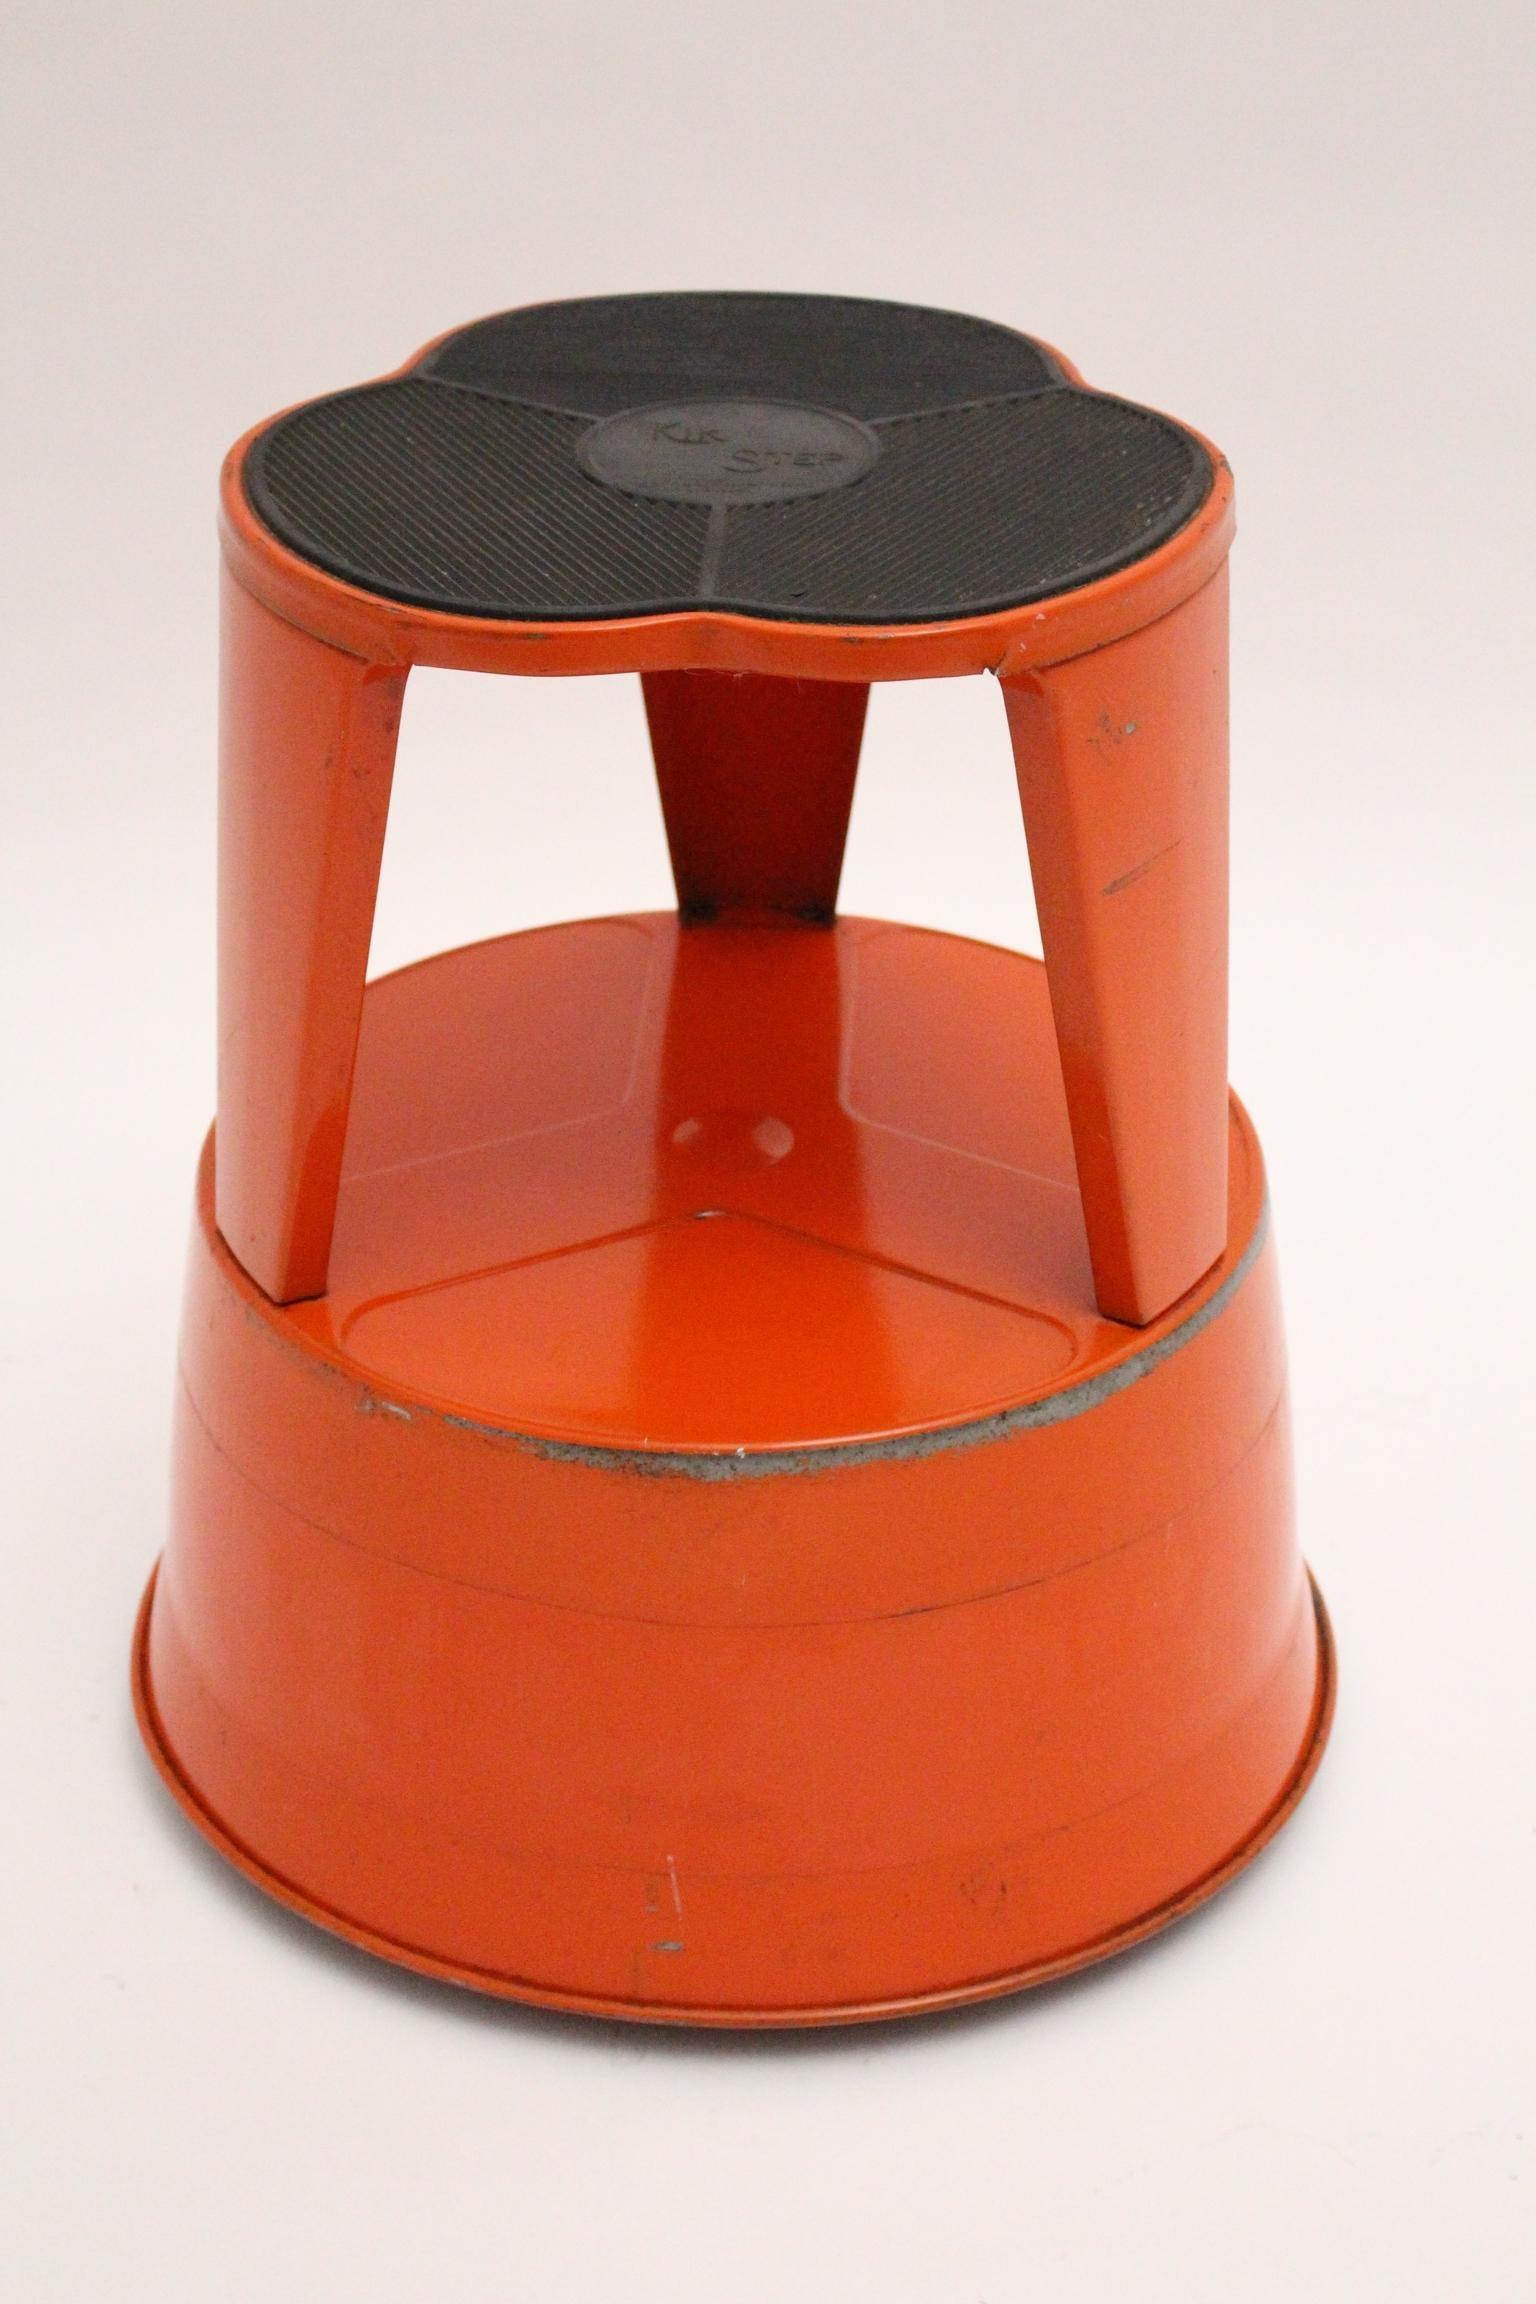 Pleasing Vintage Red Metal Kik Step Stool By Marc Adnet Blanc Mesnil France 1970S Ncnpc Chair Design For Home Ncnpcorg